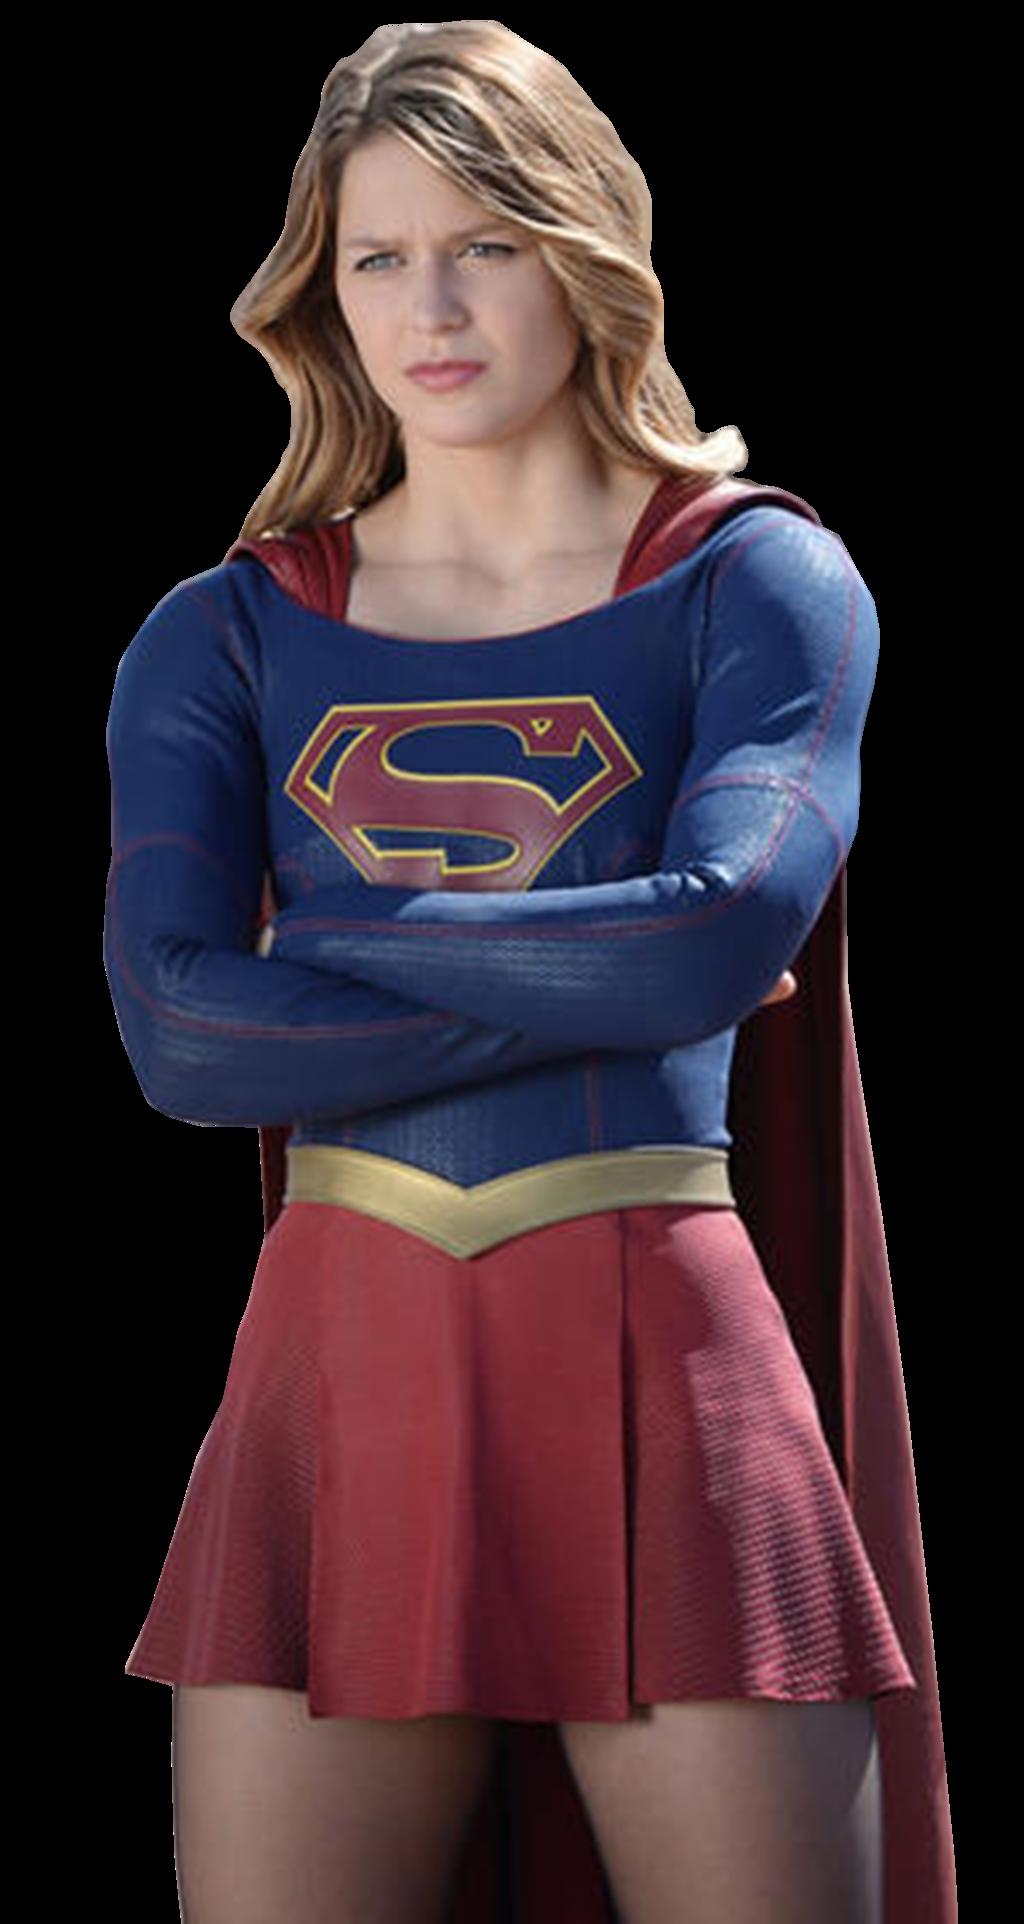 PNG File Name: Supergirl PlusPng.com  - Supergirl PNG